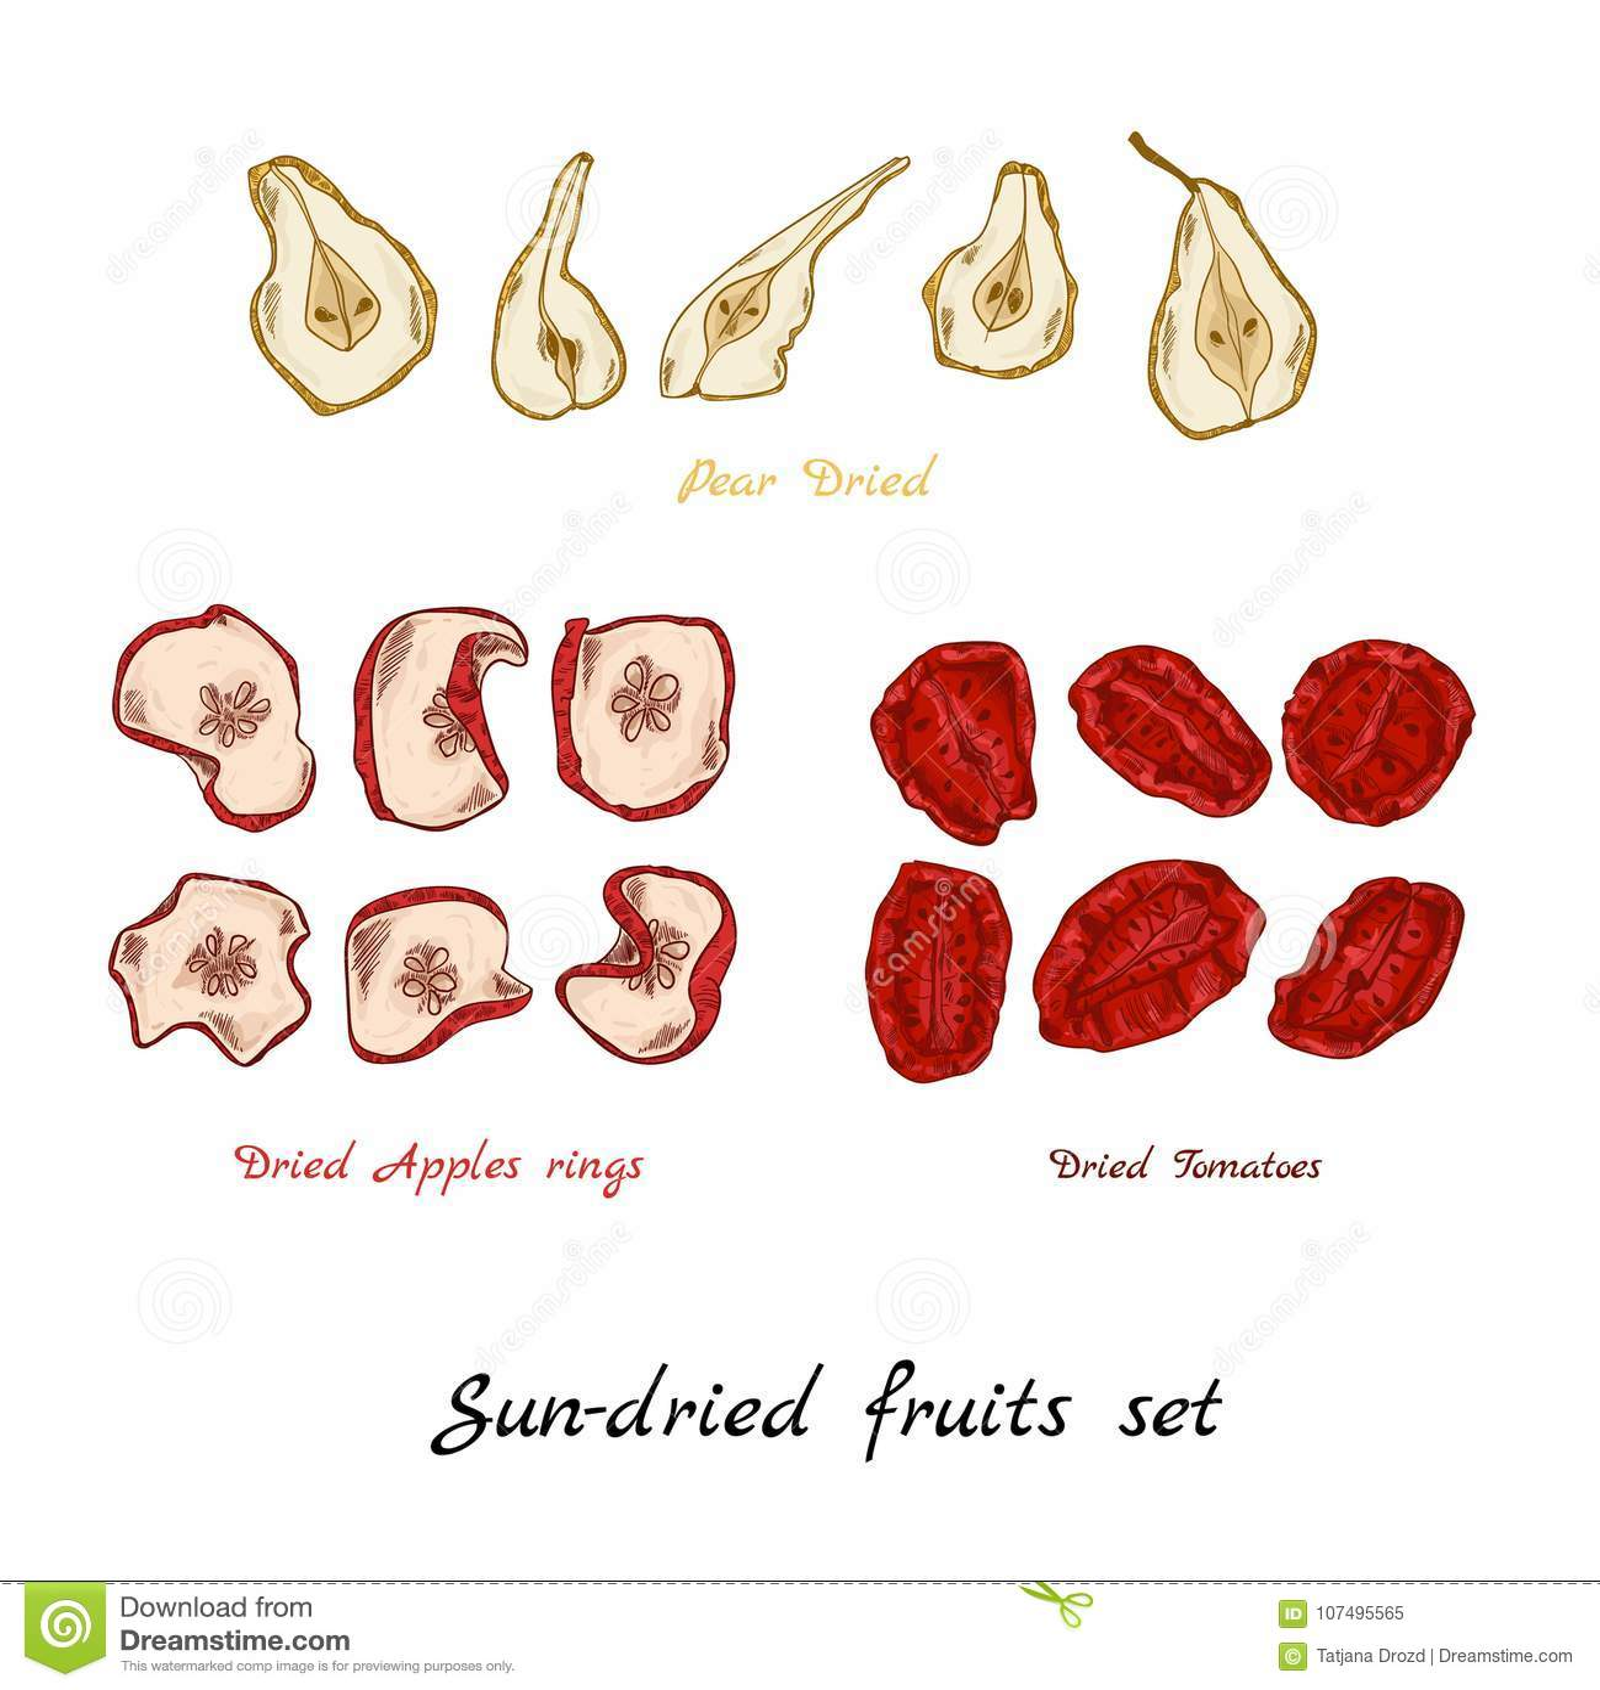 Sun-dried fruit